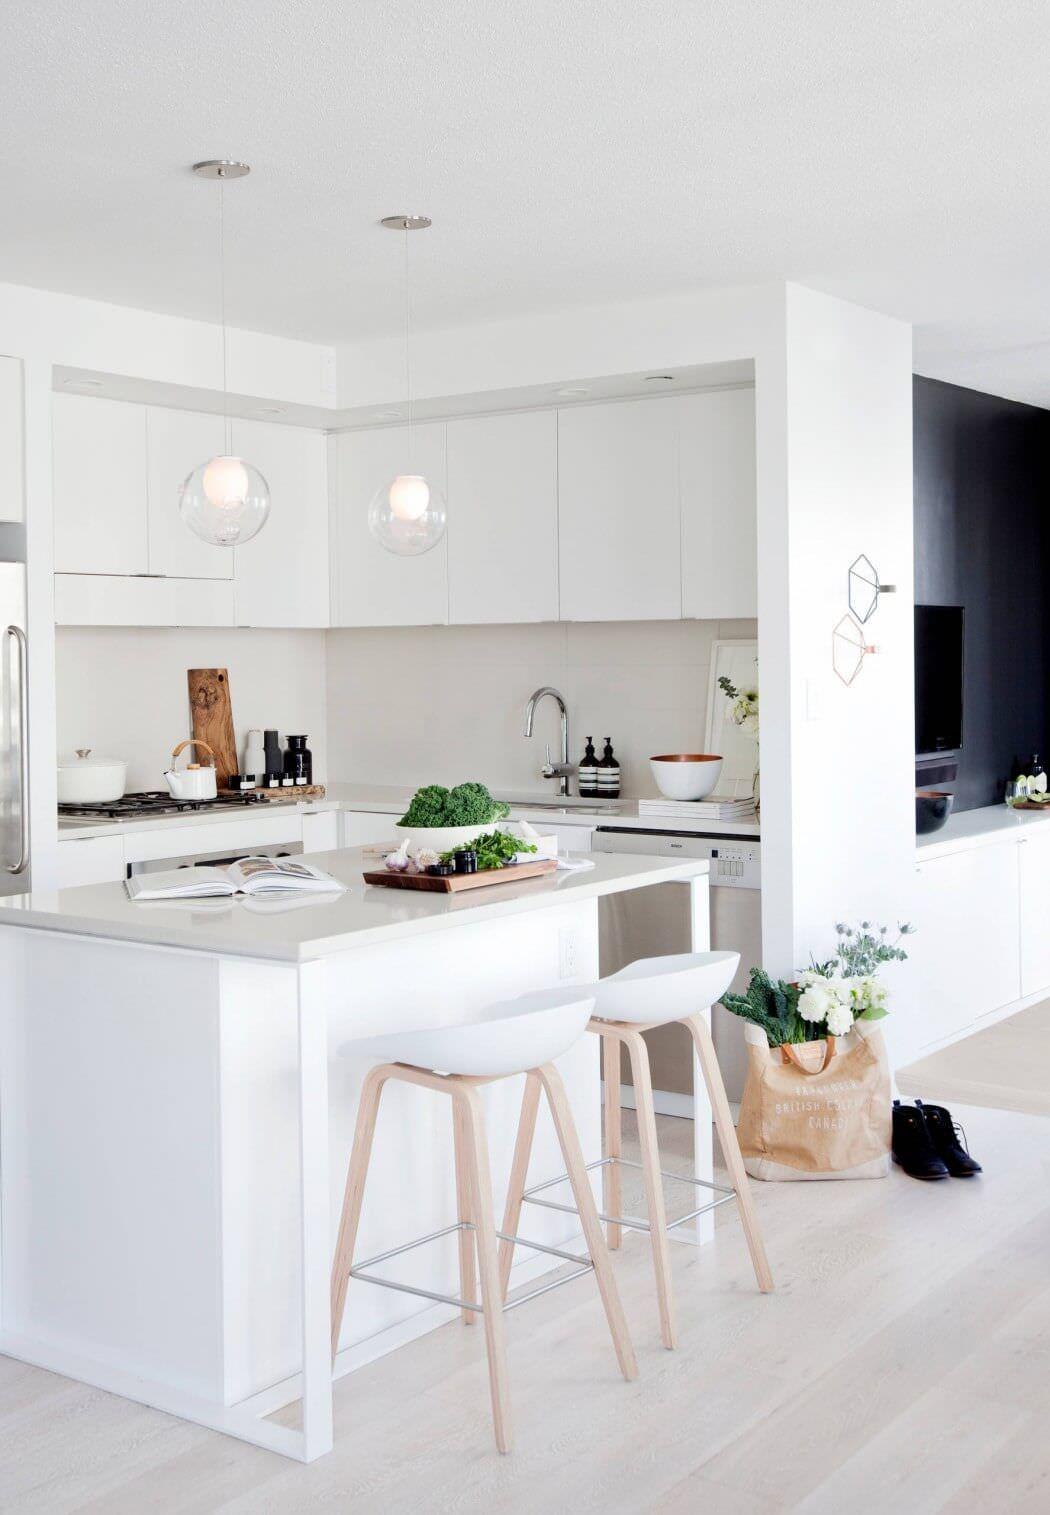 Mobili Per Cucina Piccola 100 idee cucine moderne • stile e design per la cucina